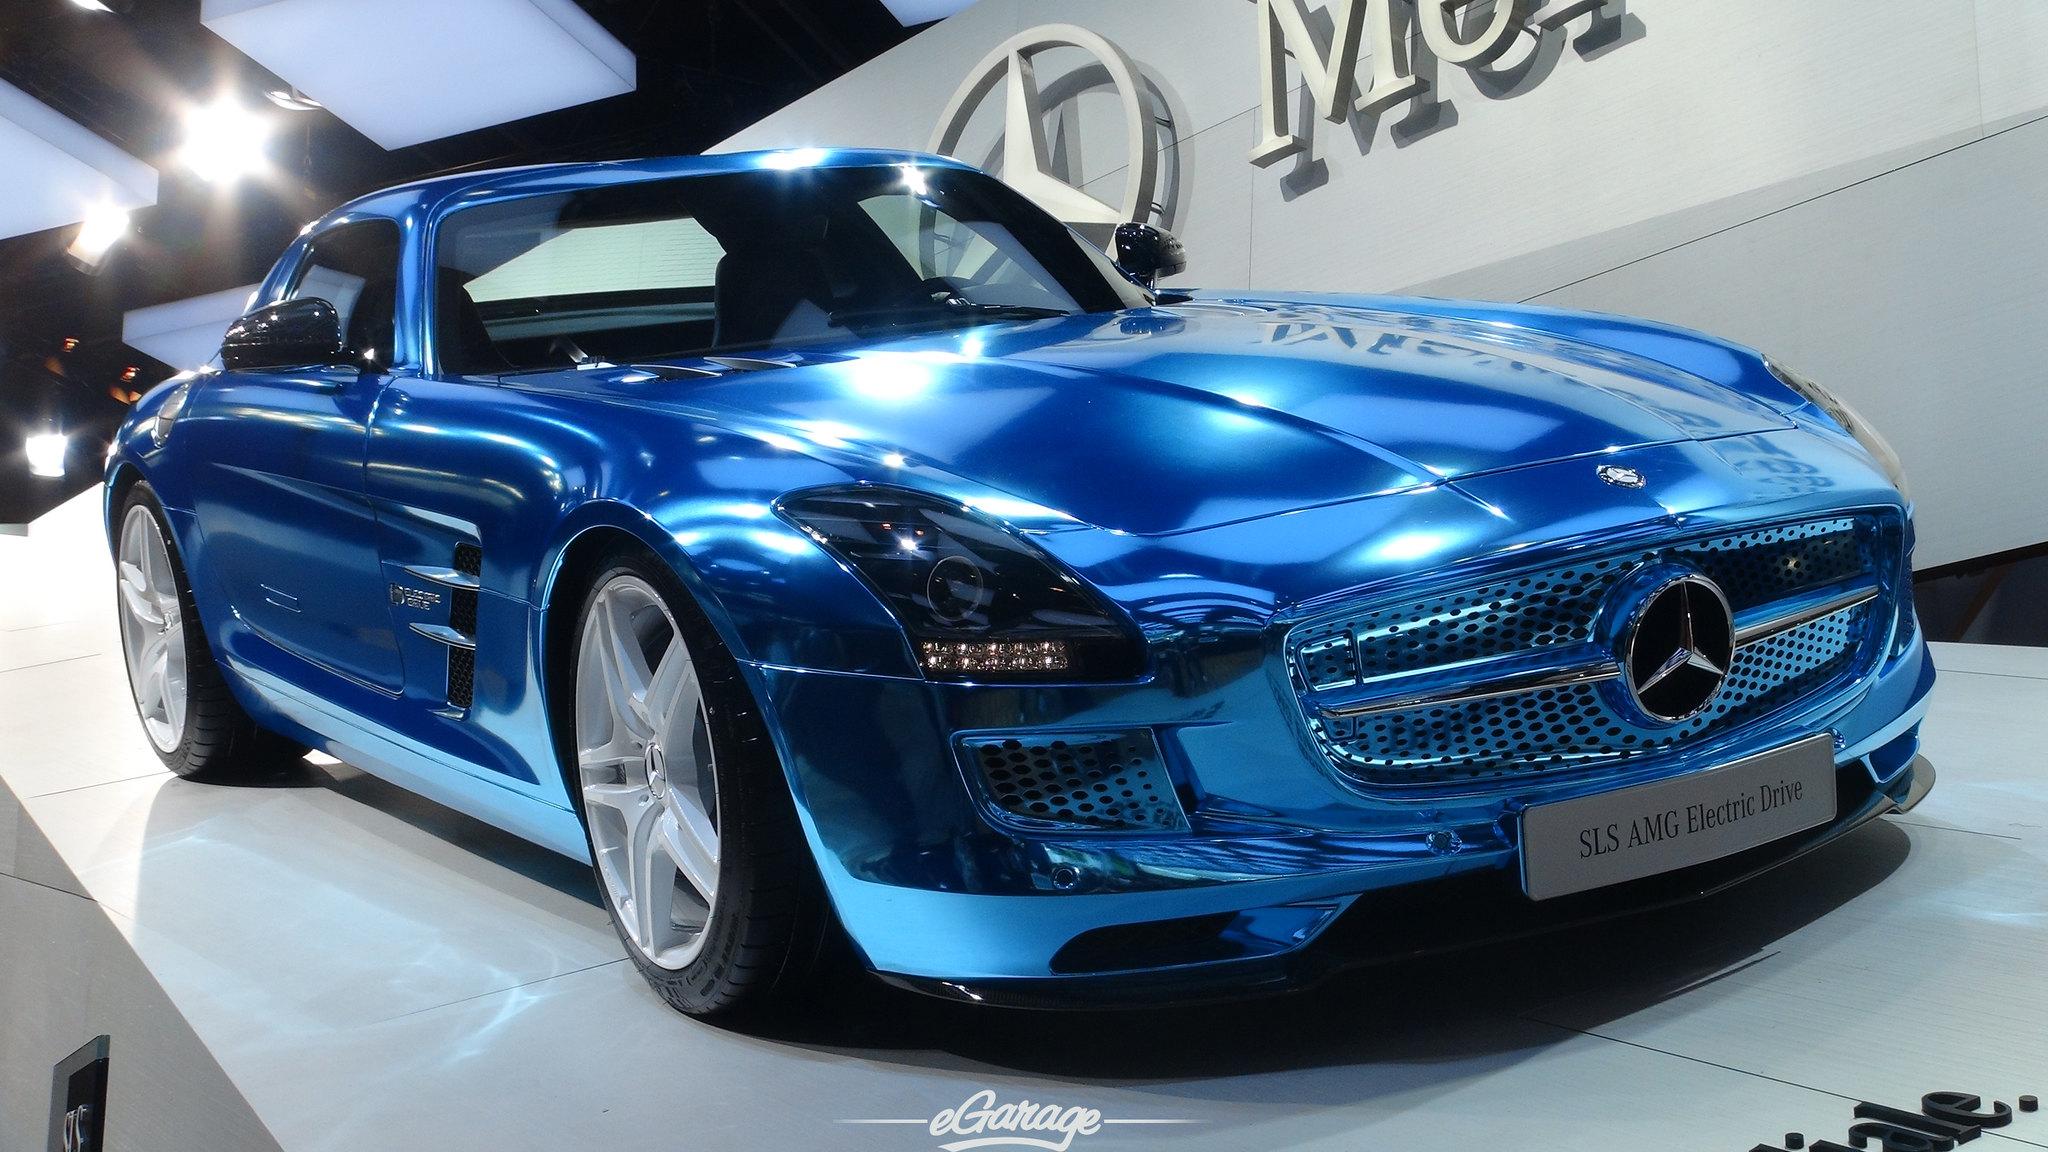 8034740899 17774c156a k 2012 Paris Motor Show